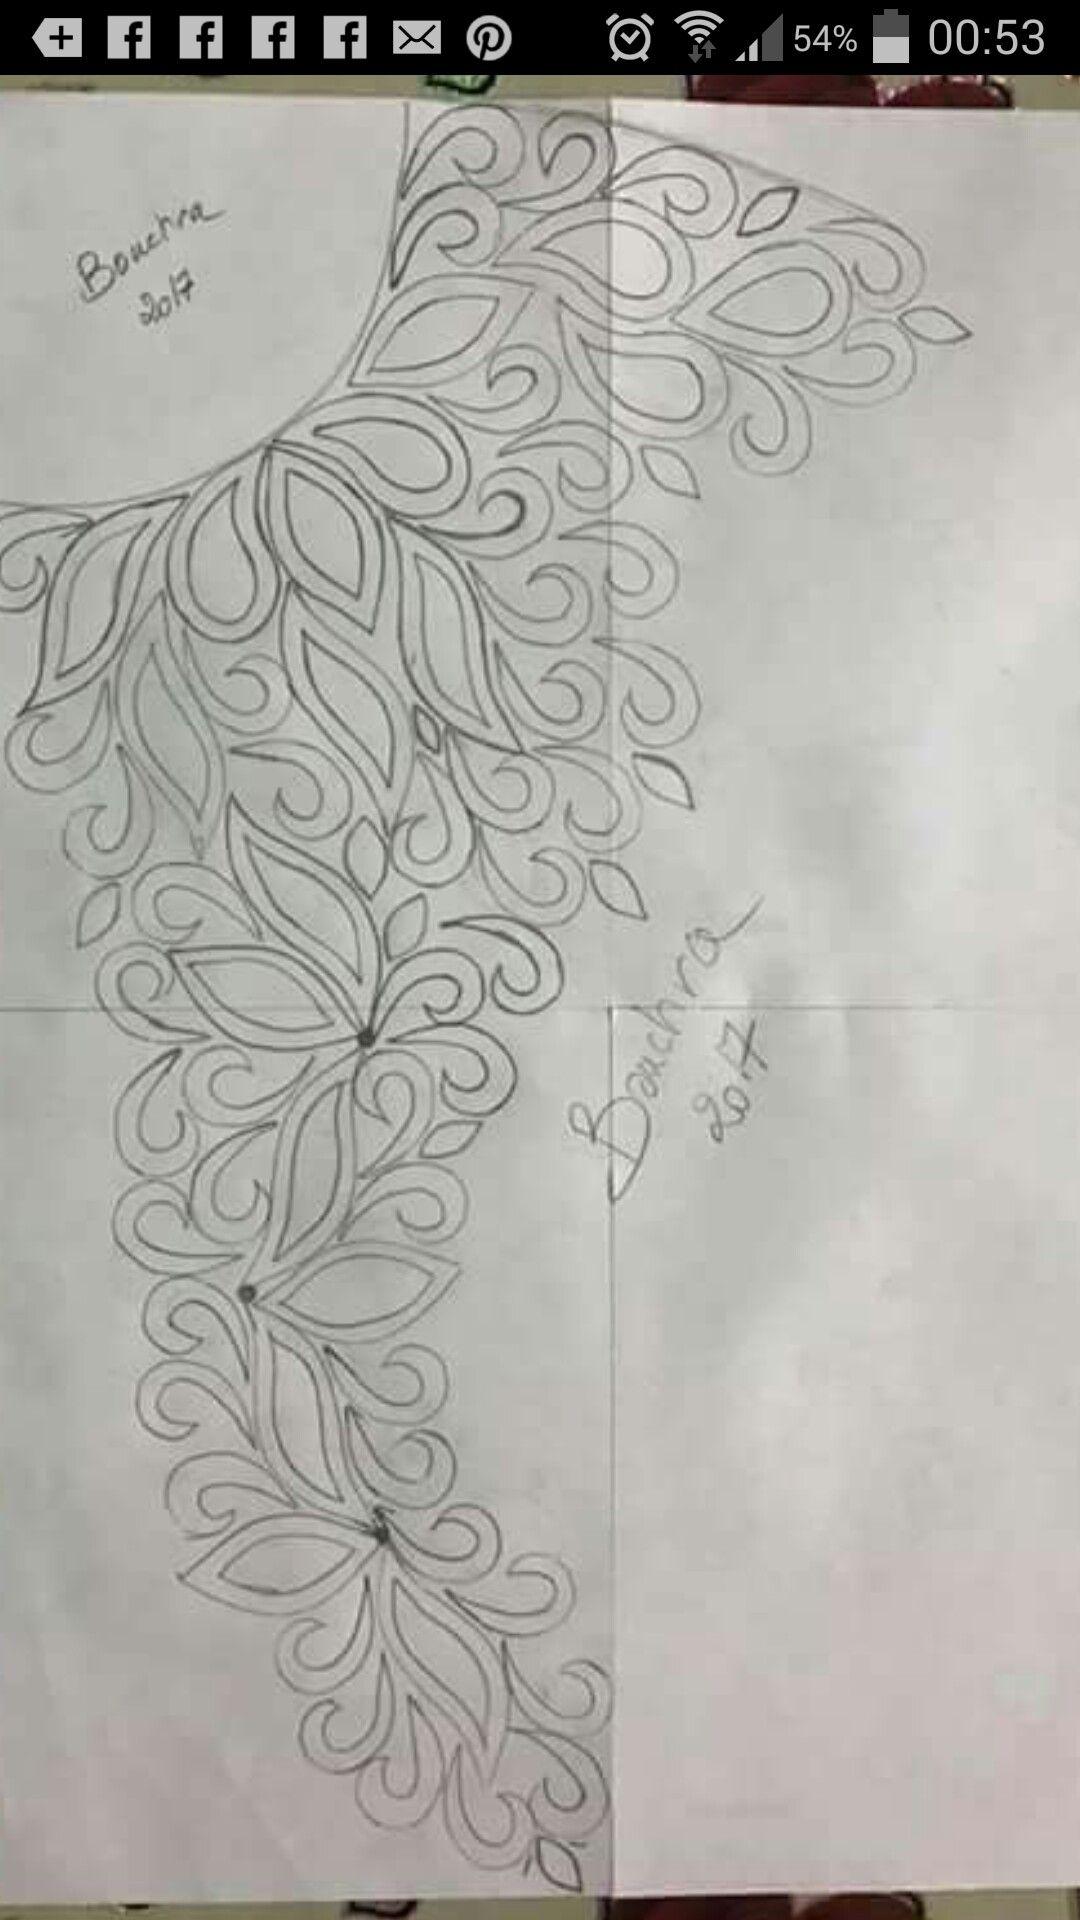 Pin by zegnouni khadija on gandoura pinterest embroidery hand